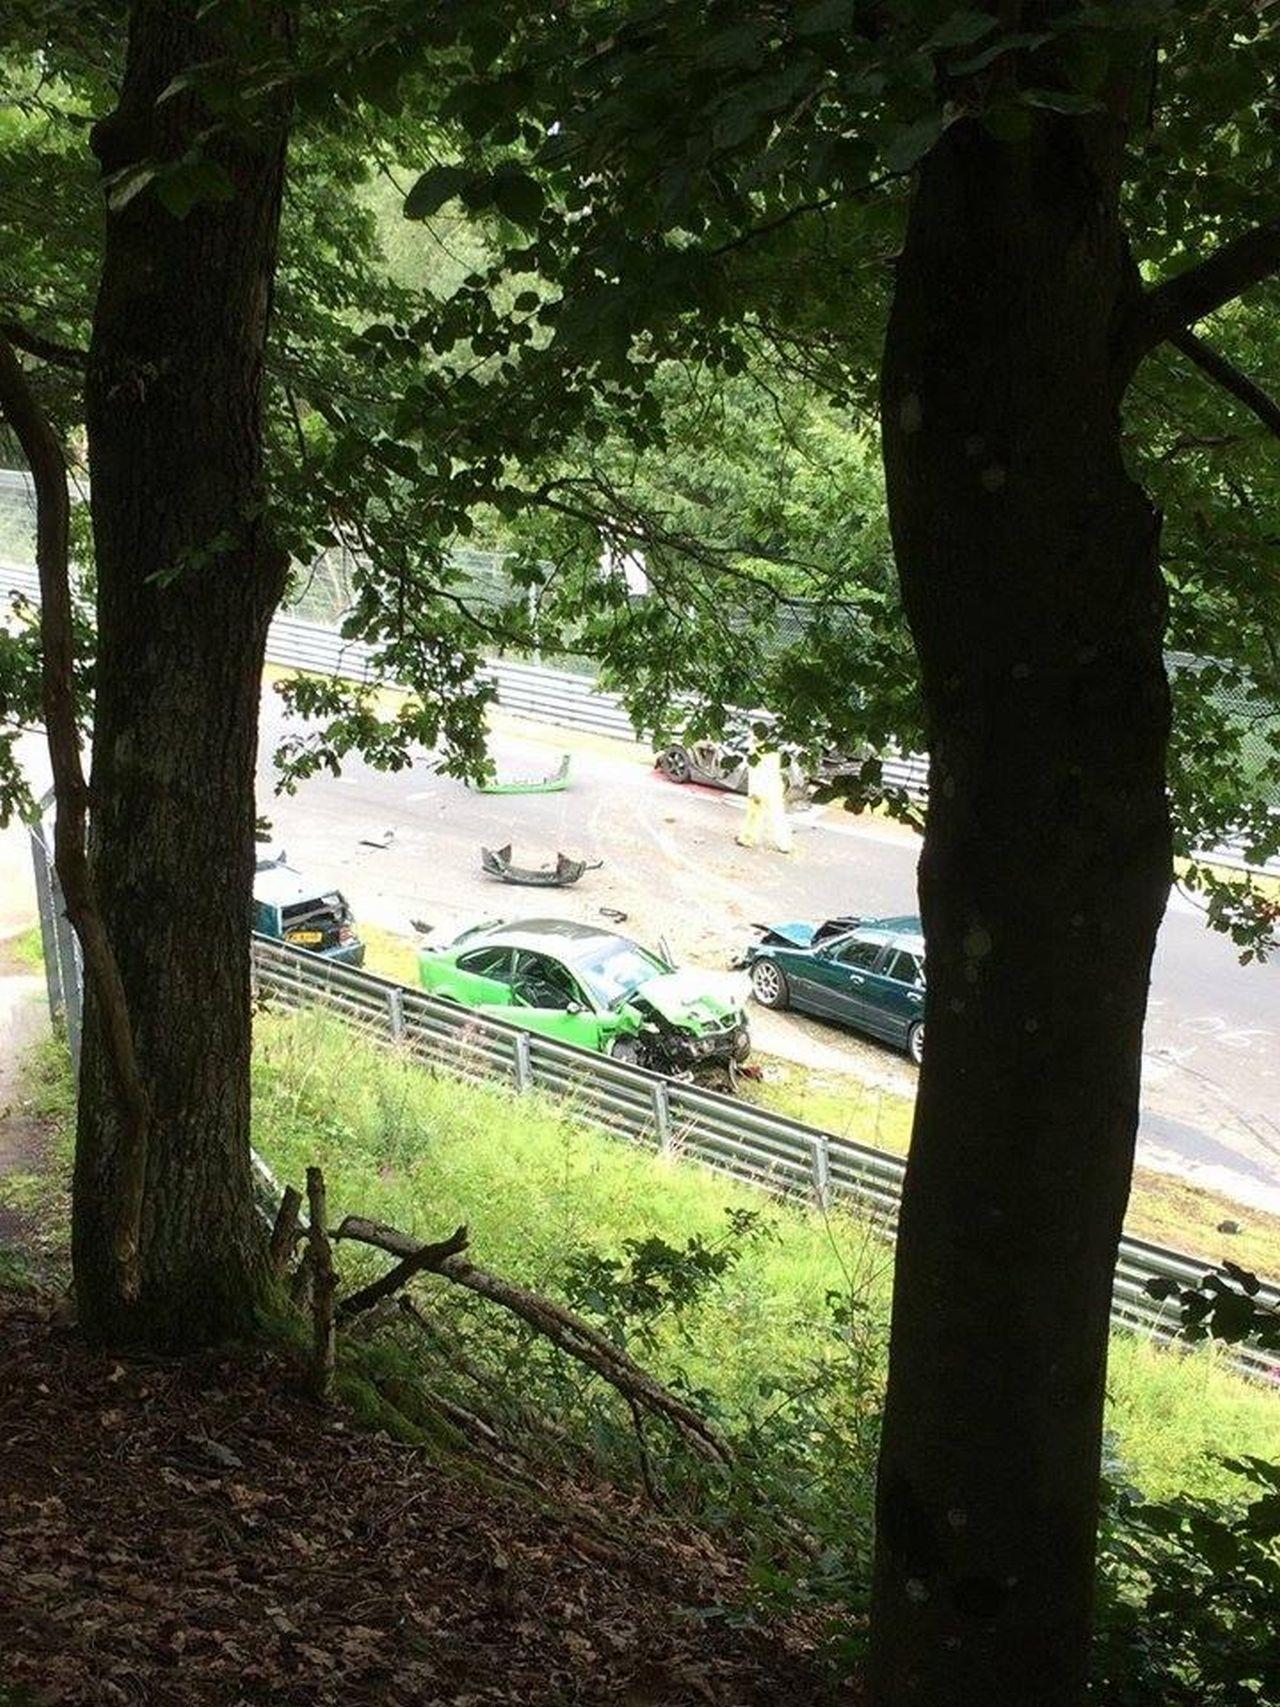 Nurburgring crash august 2017 (1)